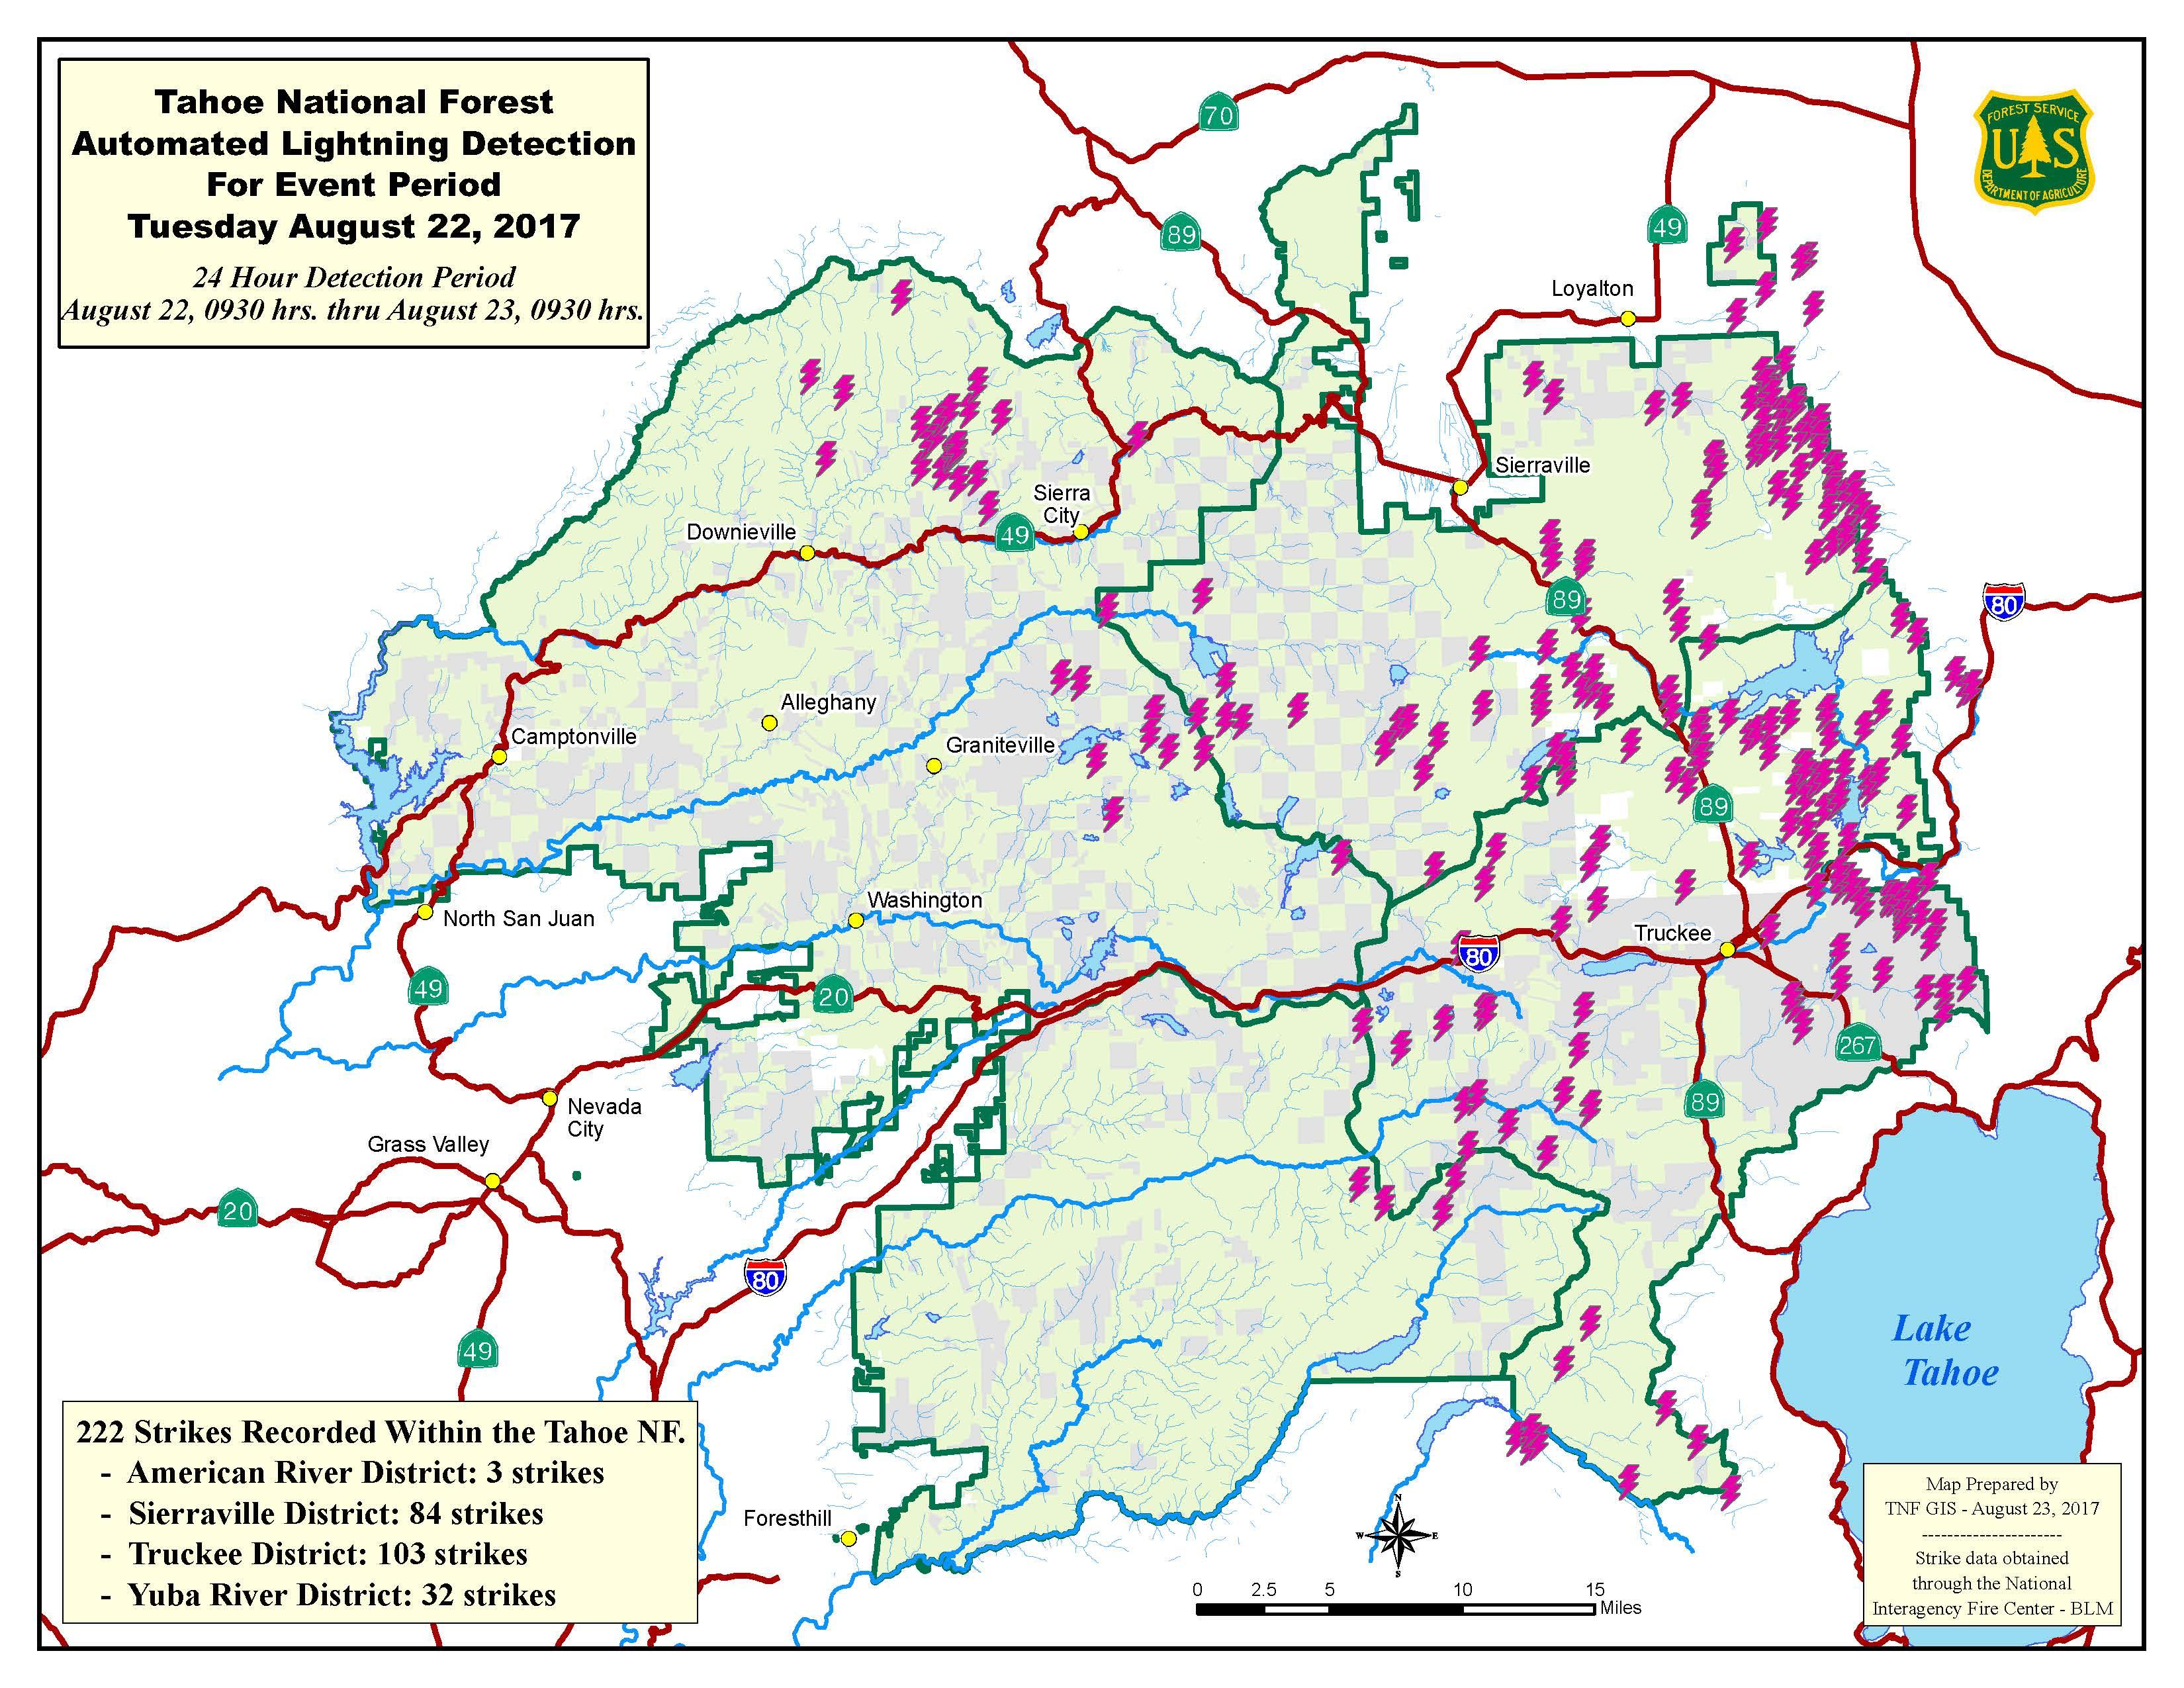 Lightning Map Strikes Hit The Tahoe National Forest In Less - Map of lightning strikes in the us